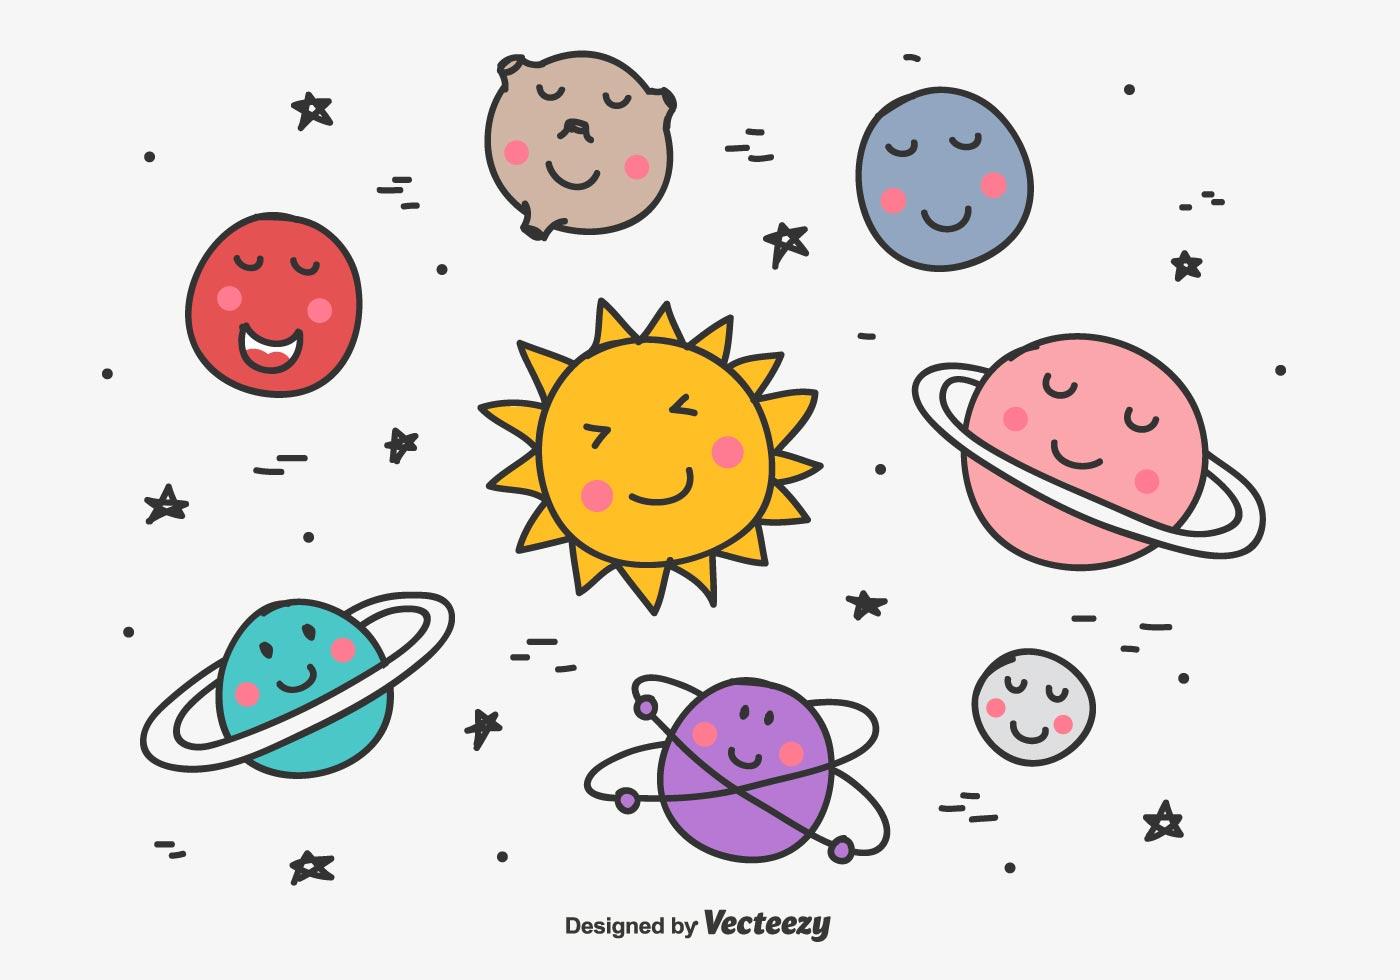 Planet Free Vector Art 12743 Downloads Illustration Solar System Orbit Diagram Digital Doodle Planets Set